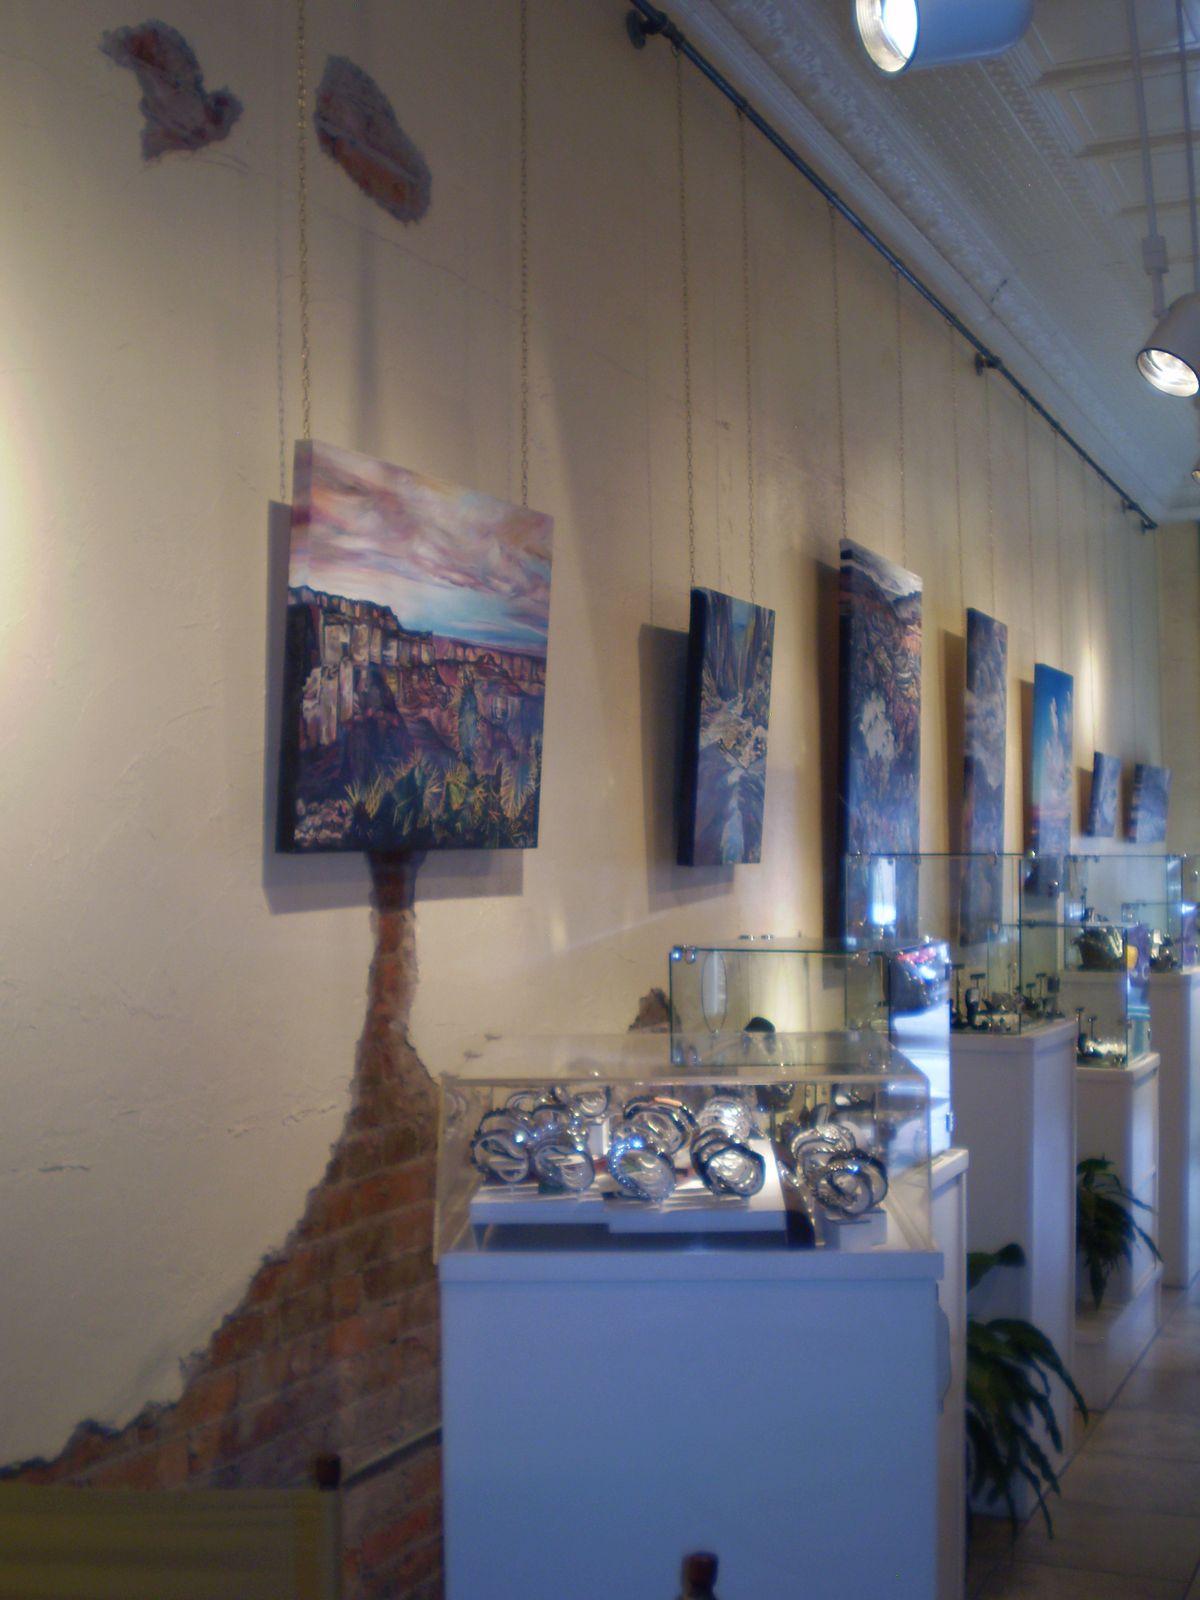 Will Mcnabb gallery